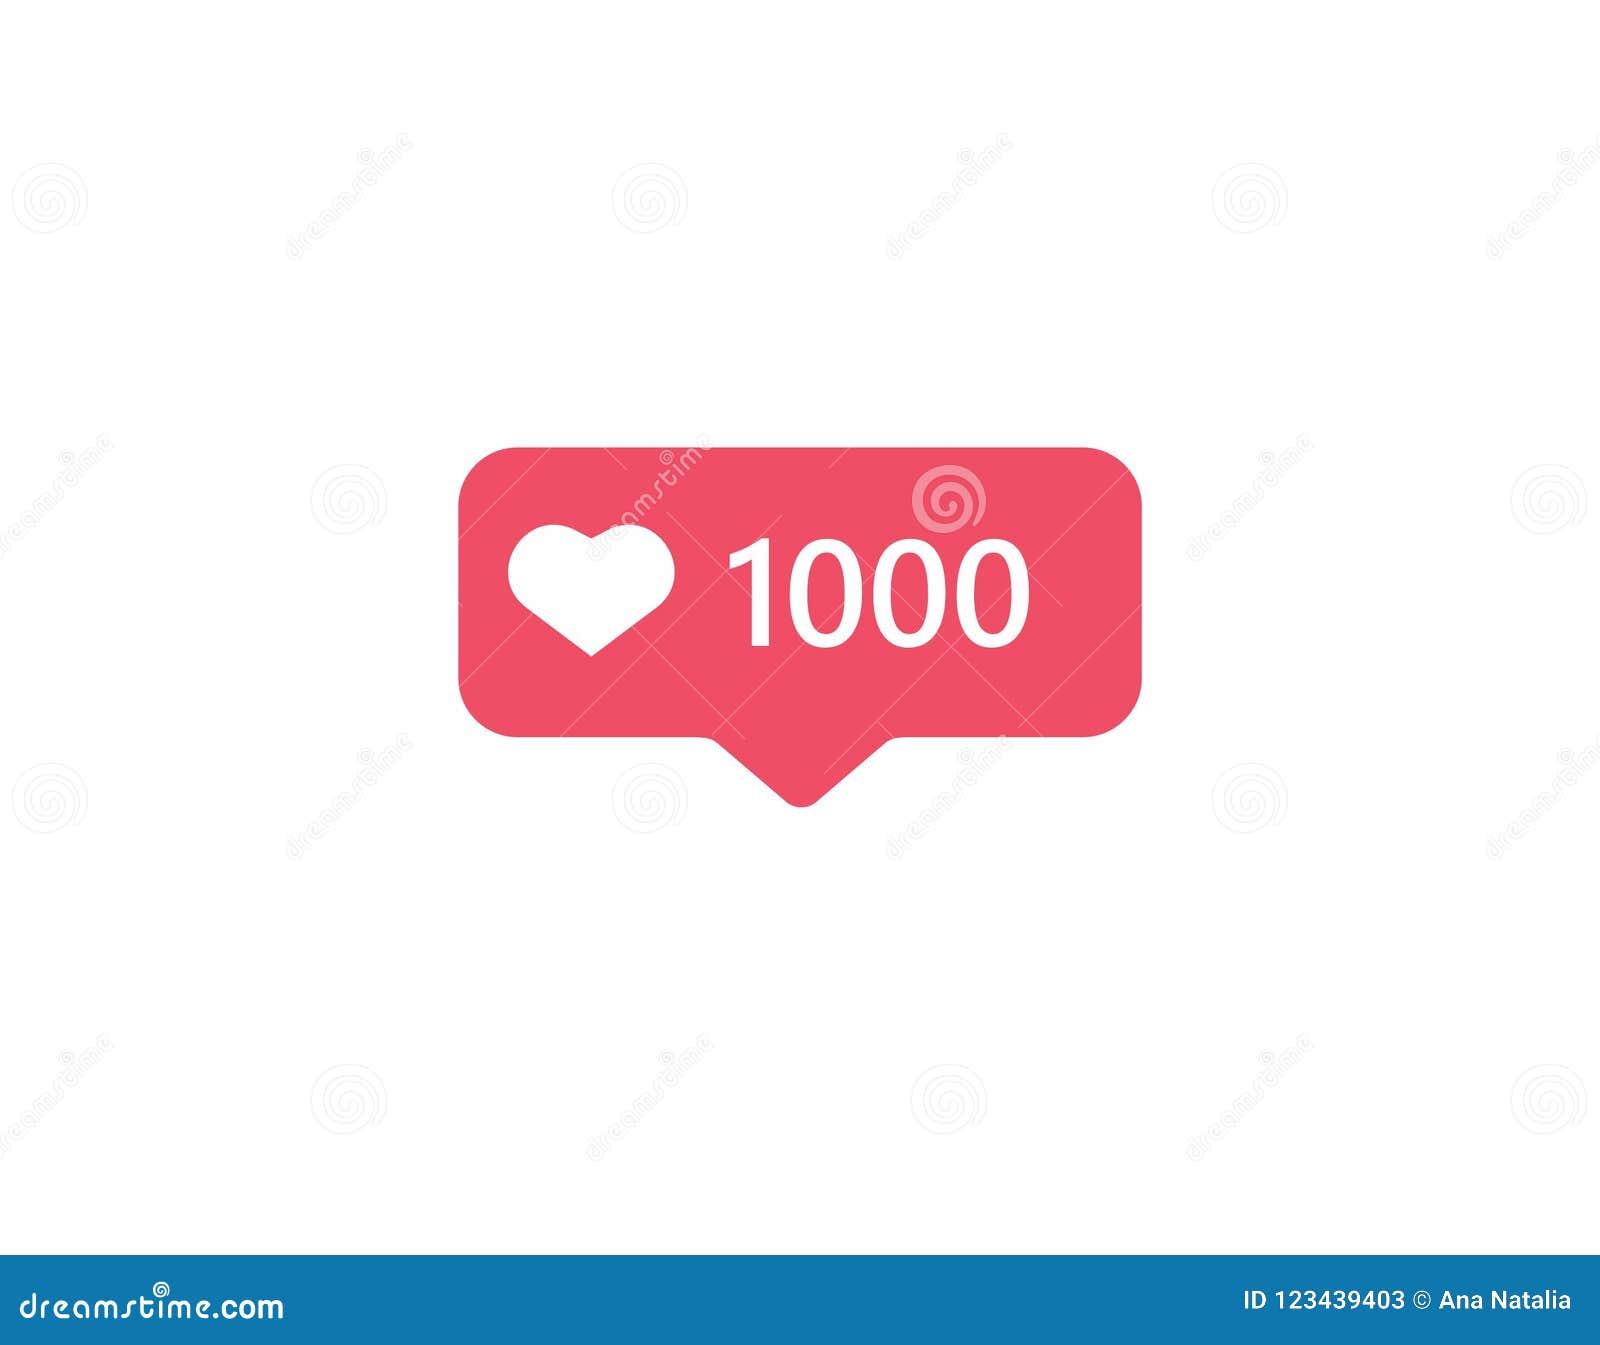 Vector Illustration Instagram: Notification Icon Instagram. 1000 Follower Like Instagram